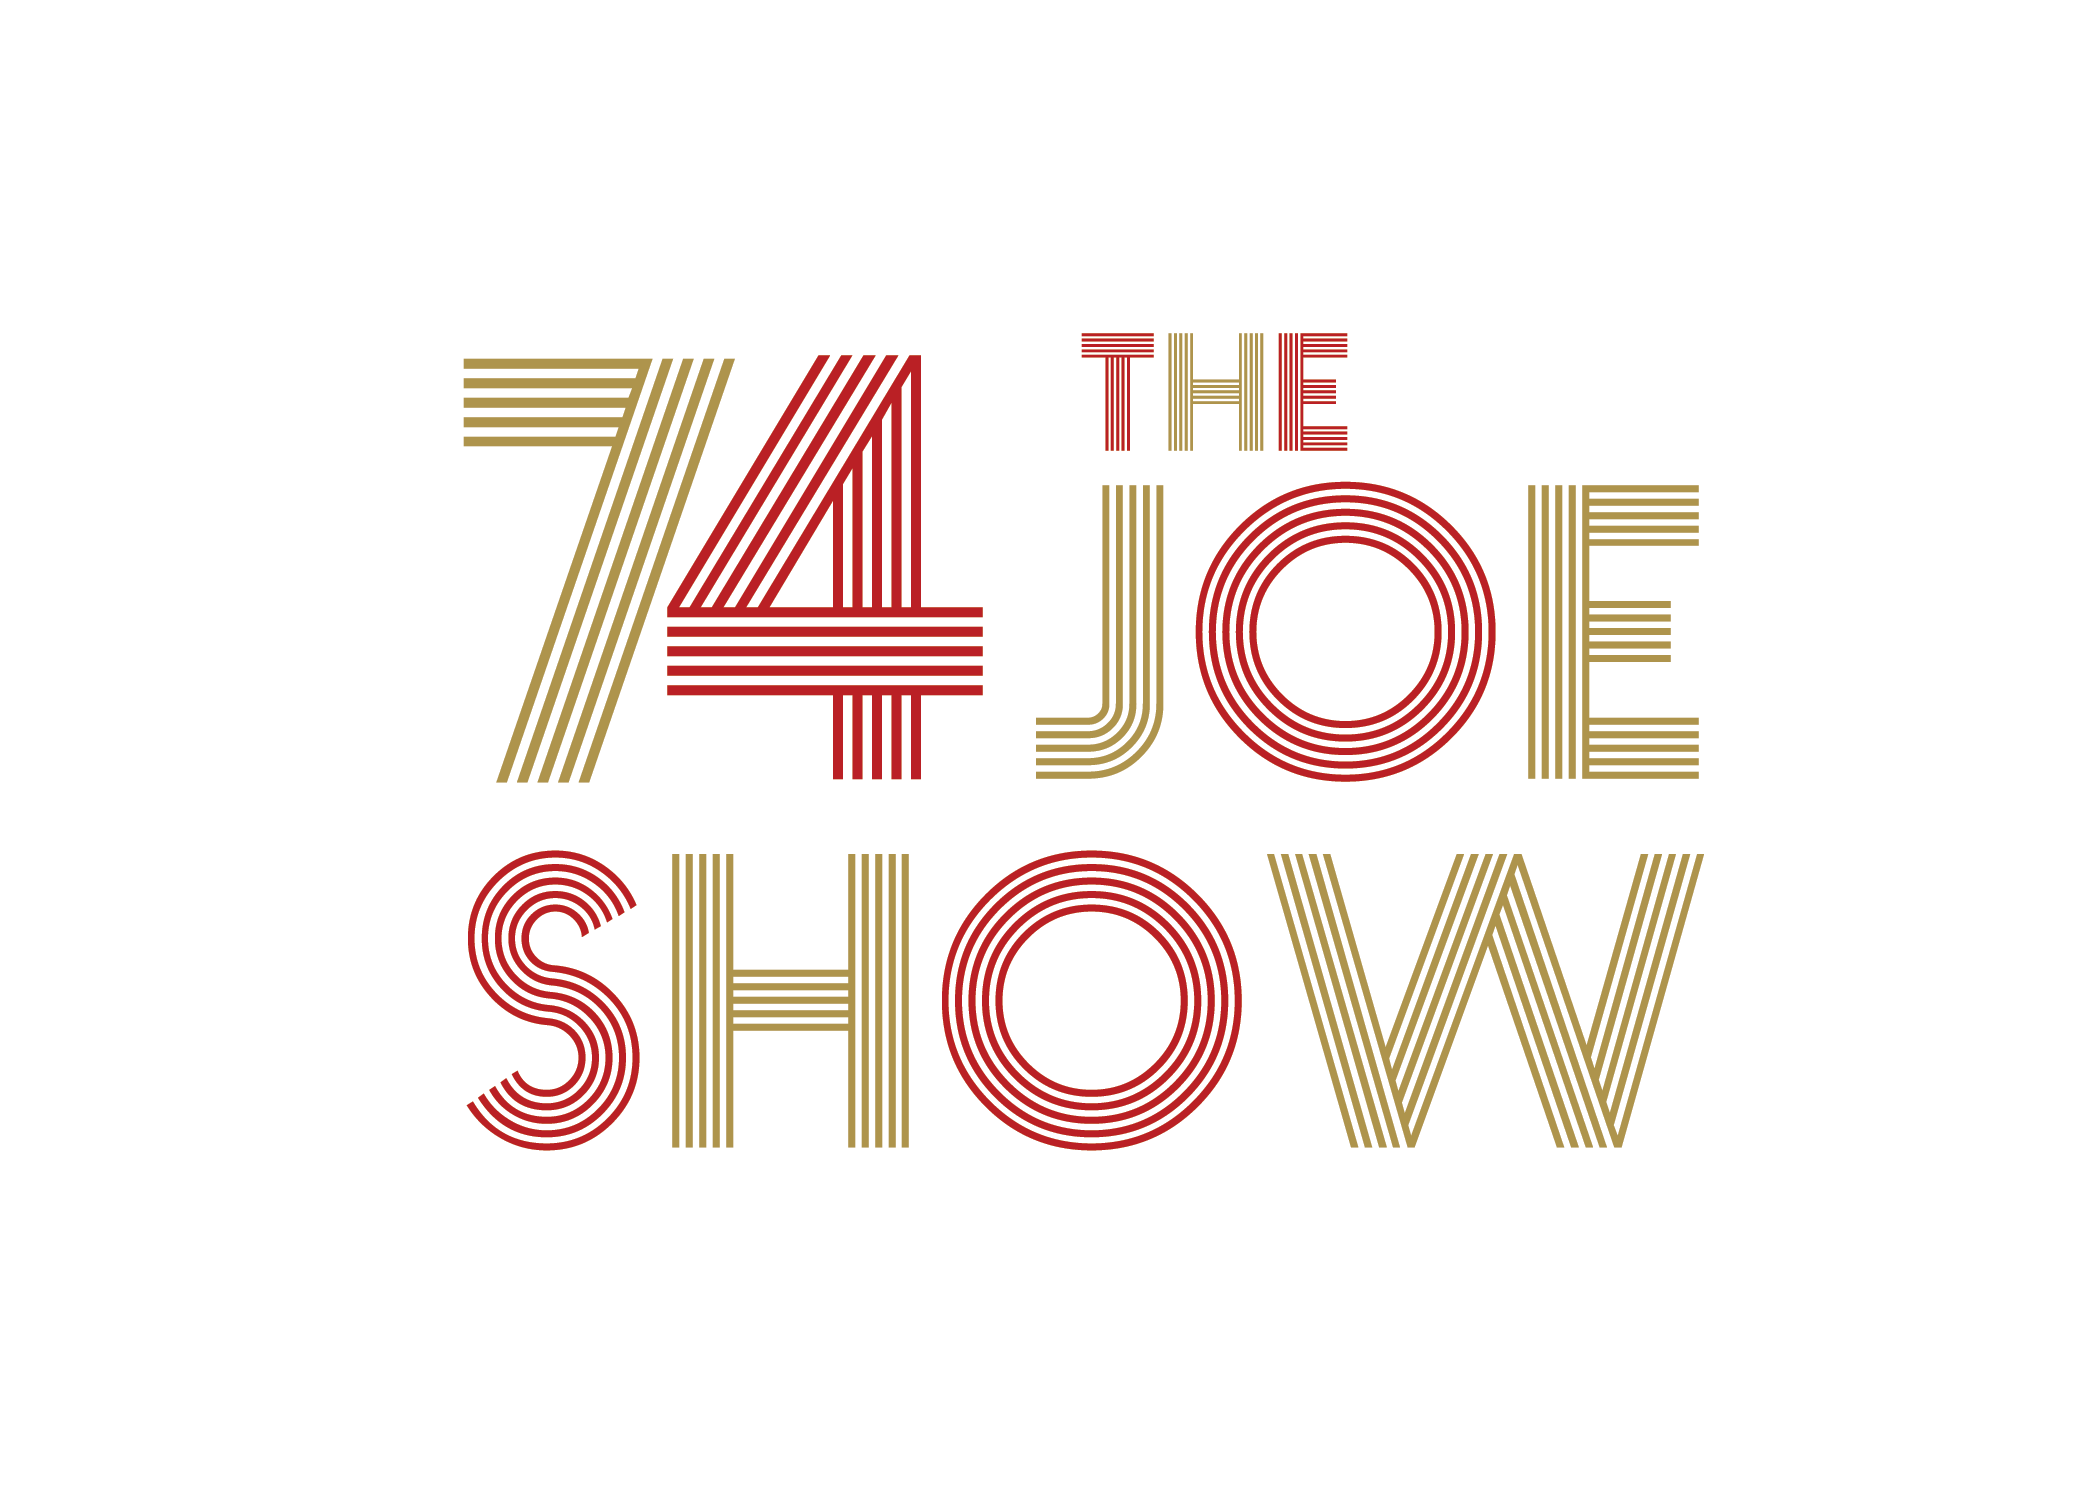 Joe-Show-prisma.png